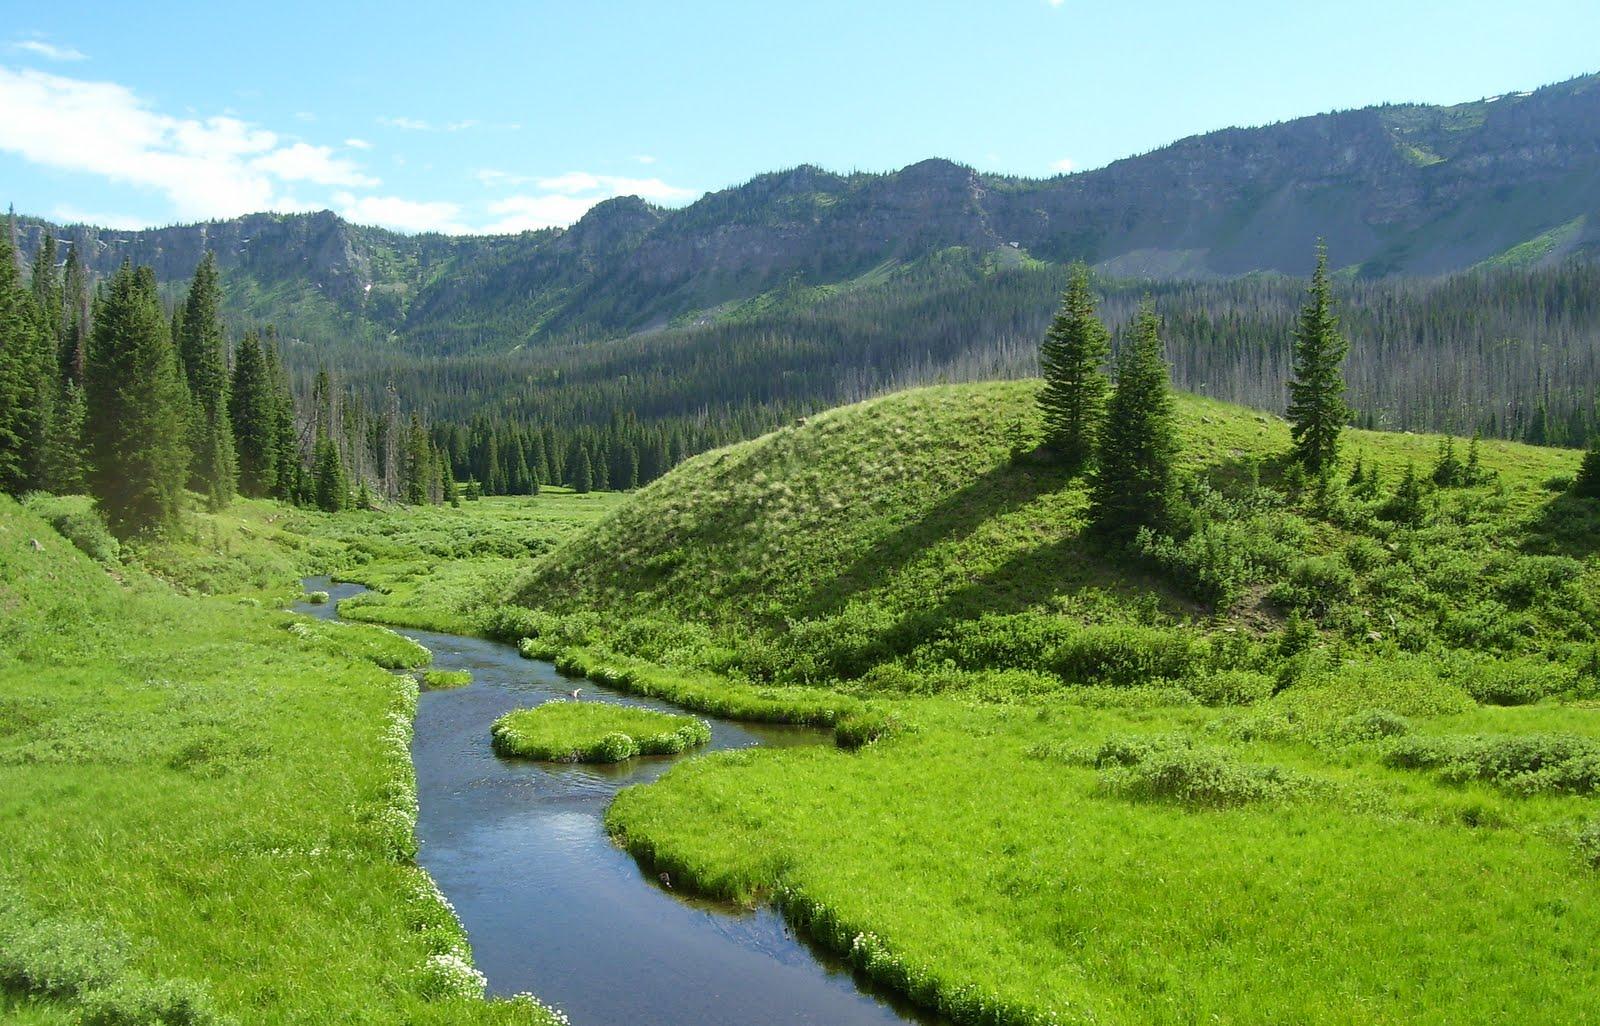 Photo: Flat Tops wilderness area.